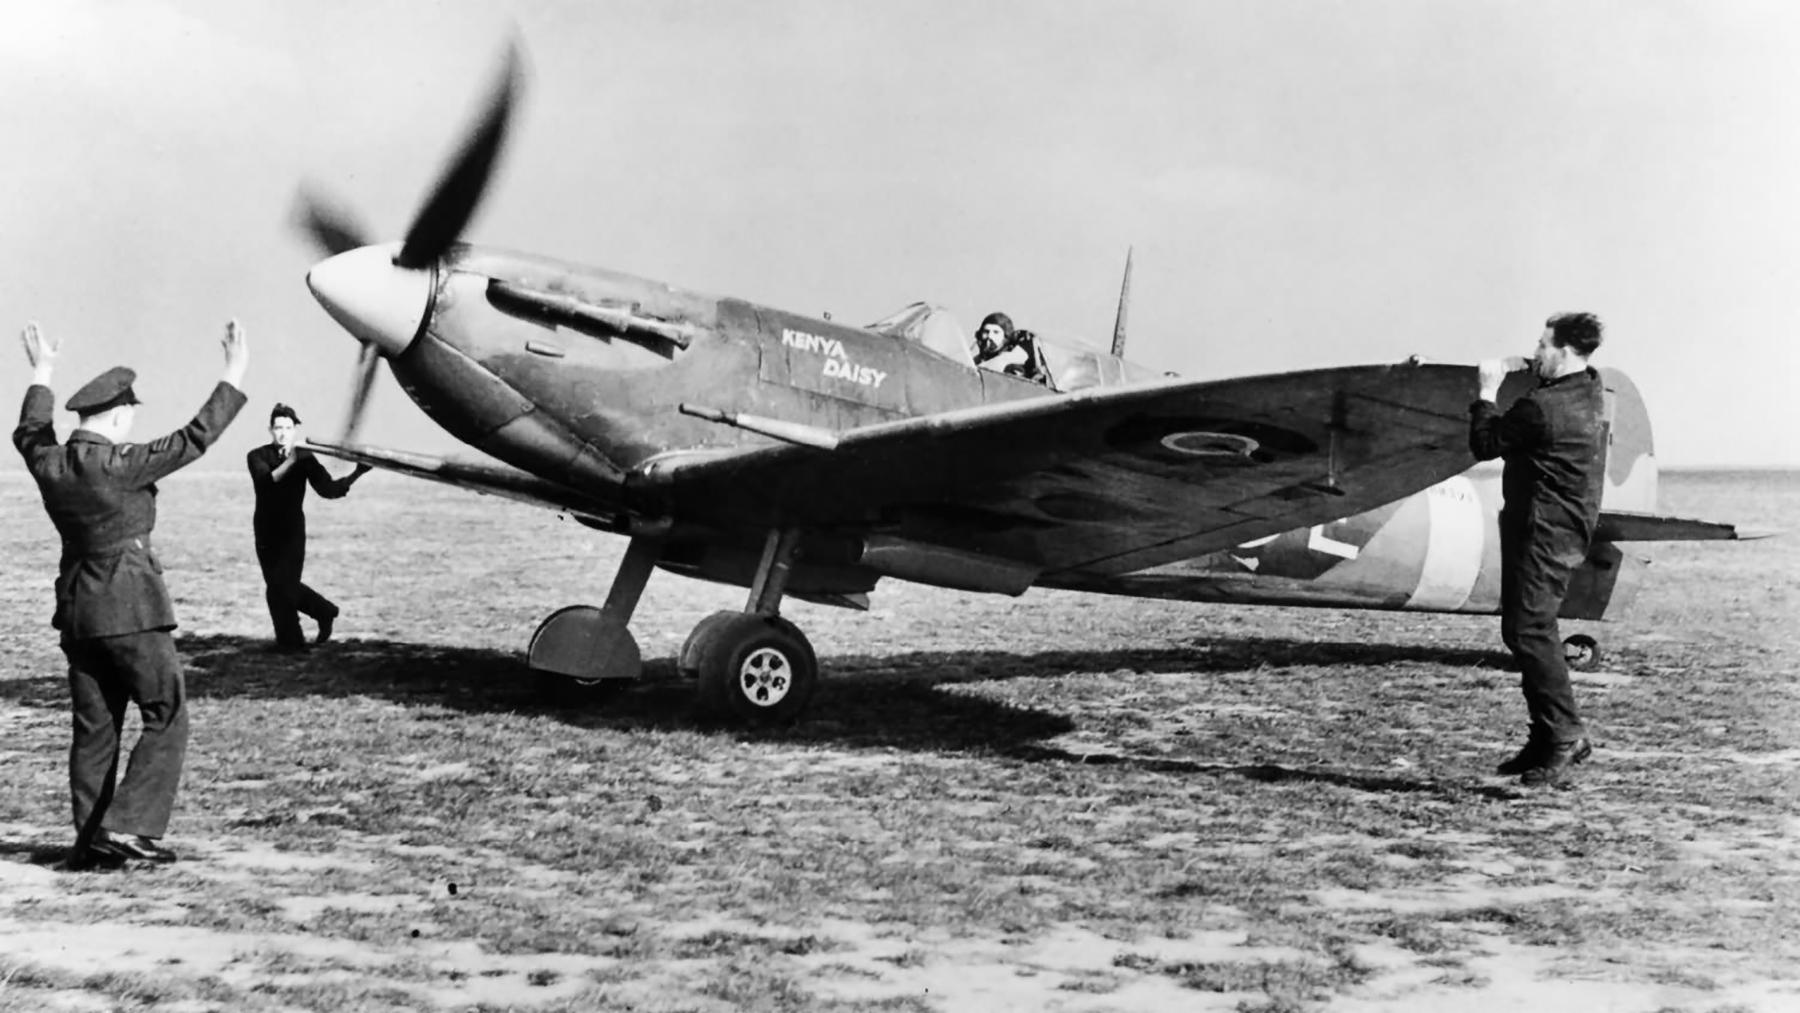 Spitfire LFVb RAF 165Sqn SKE named Kenya Daisy BM271 at Gravesend 16th Oct 1942 web 01